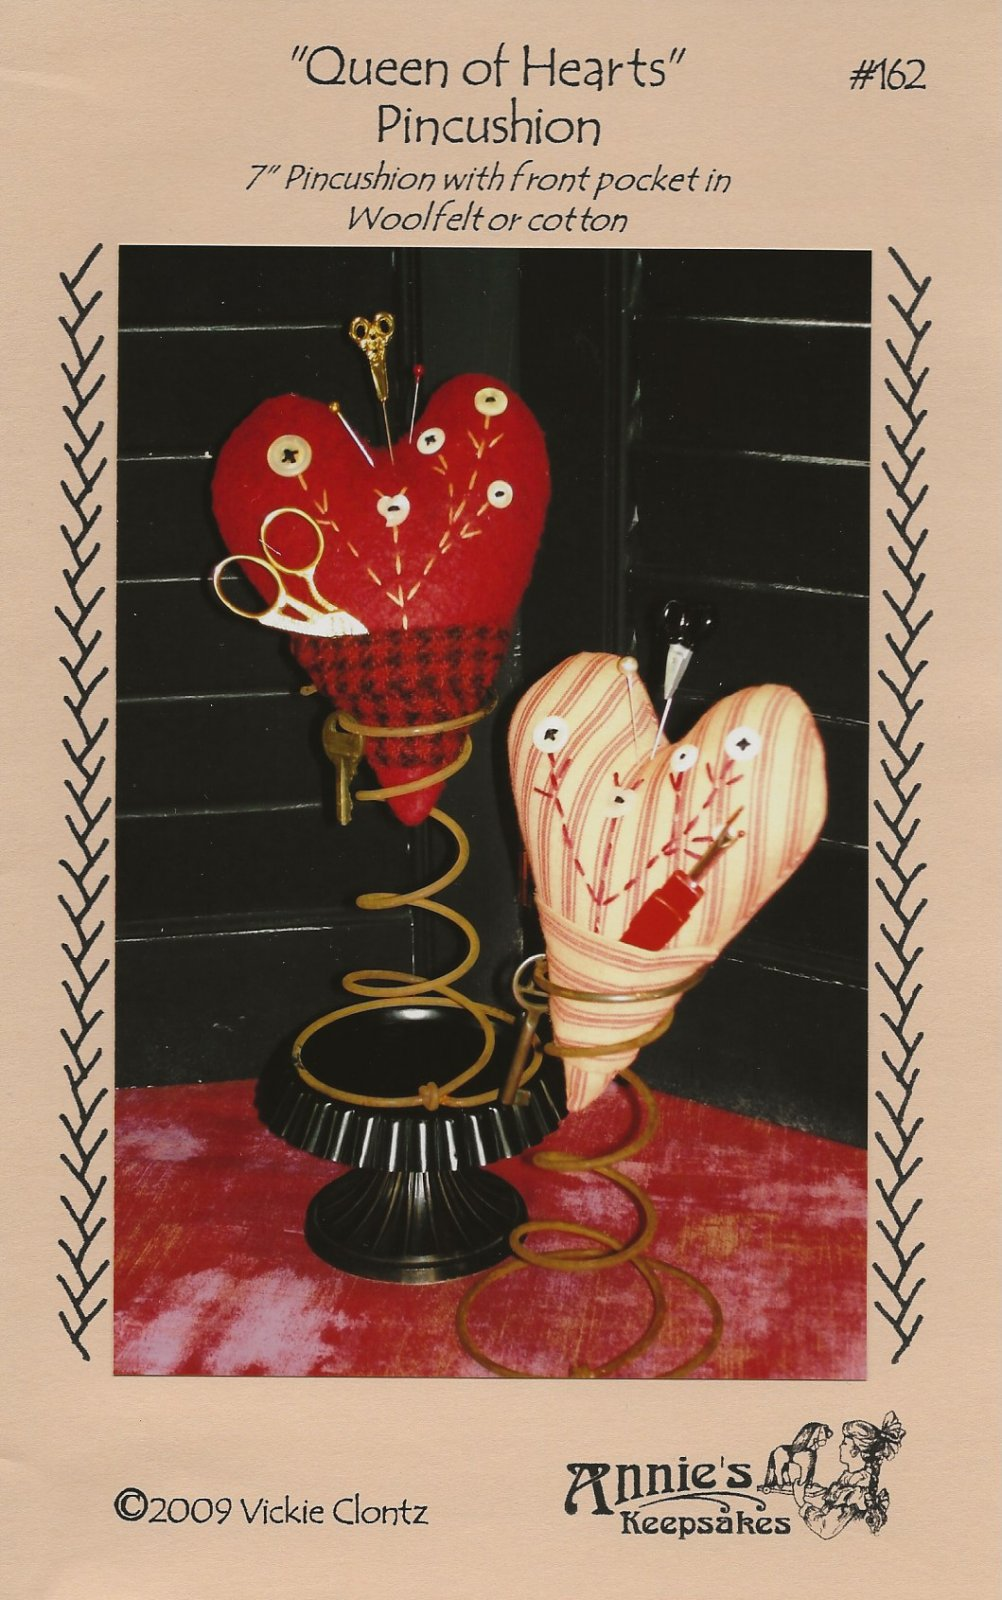 Queen of Hearts Pincushion